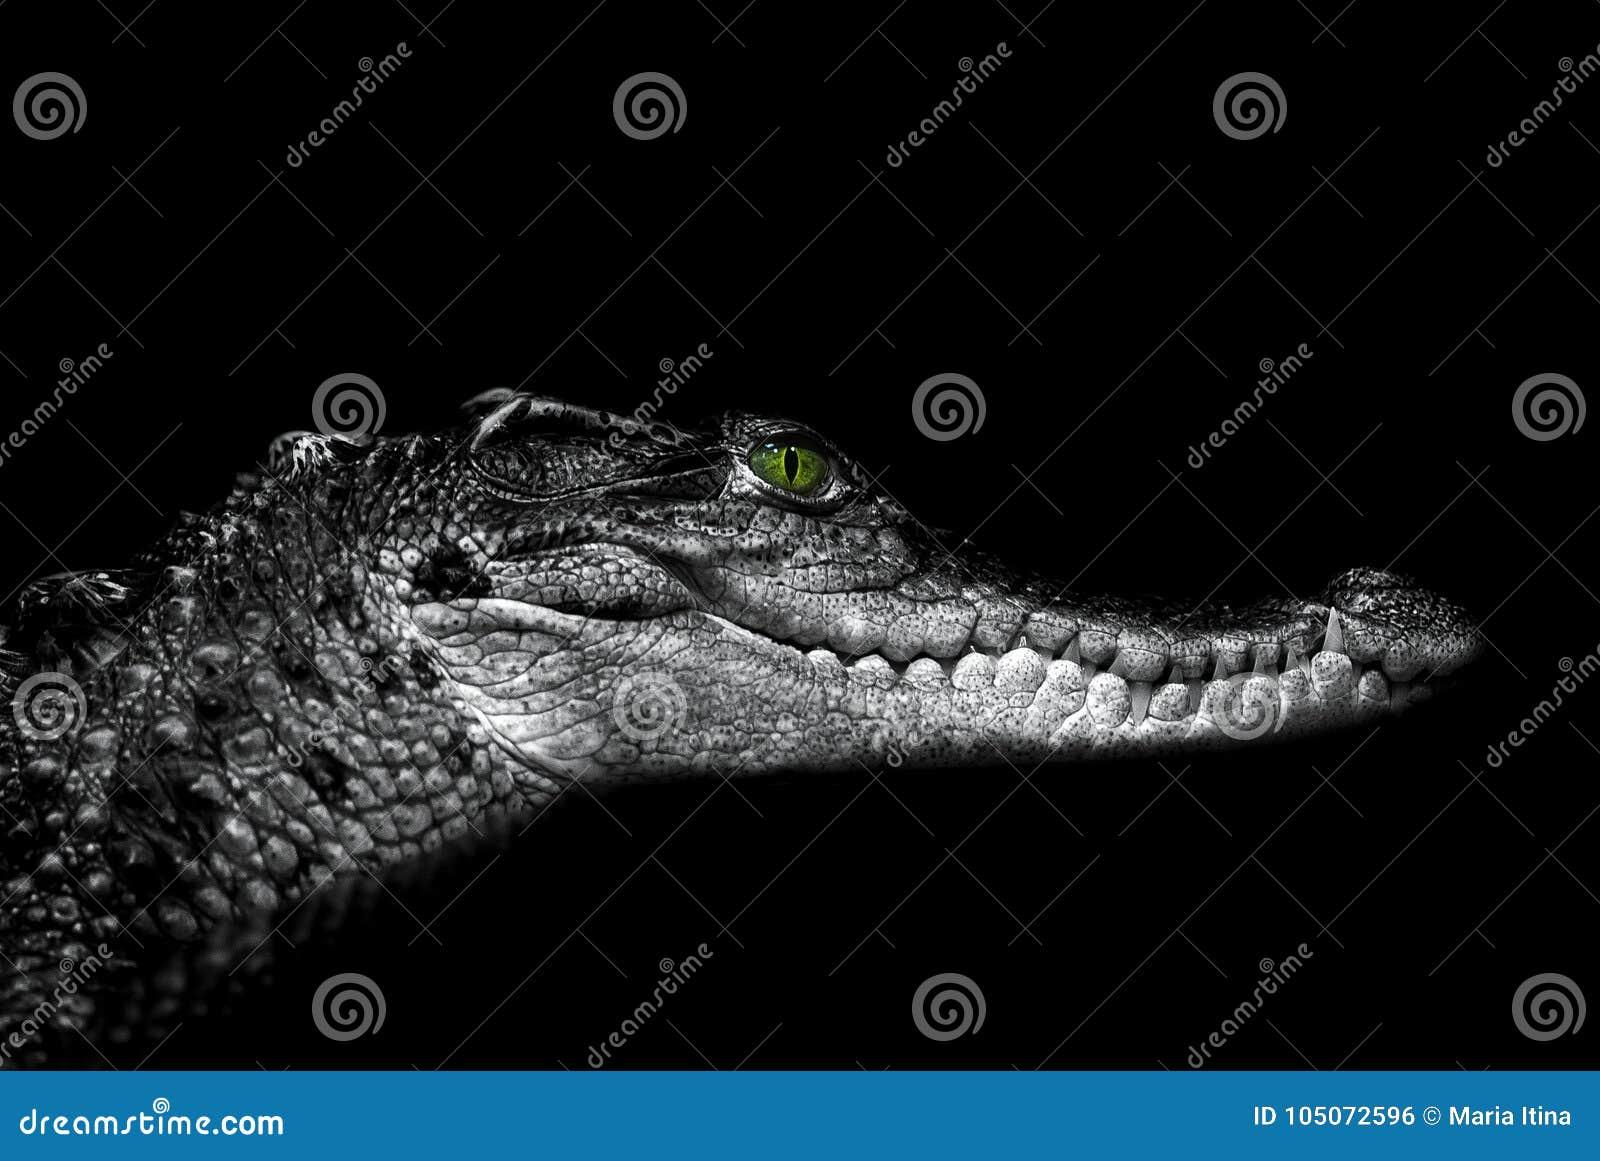 Krokodil: portret op een zwarte